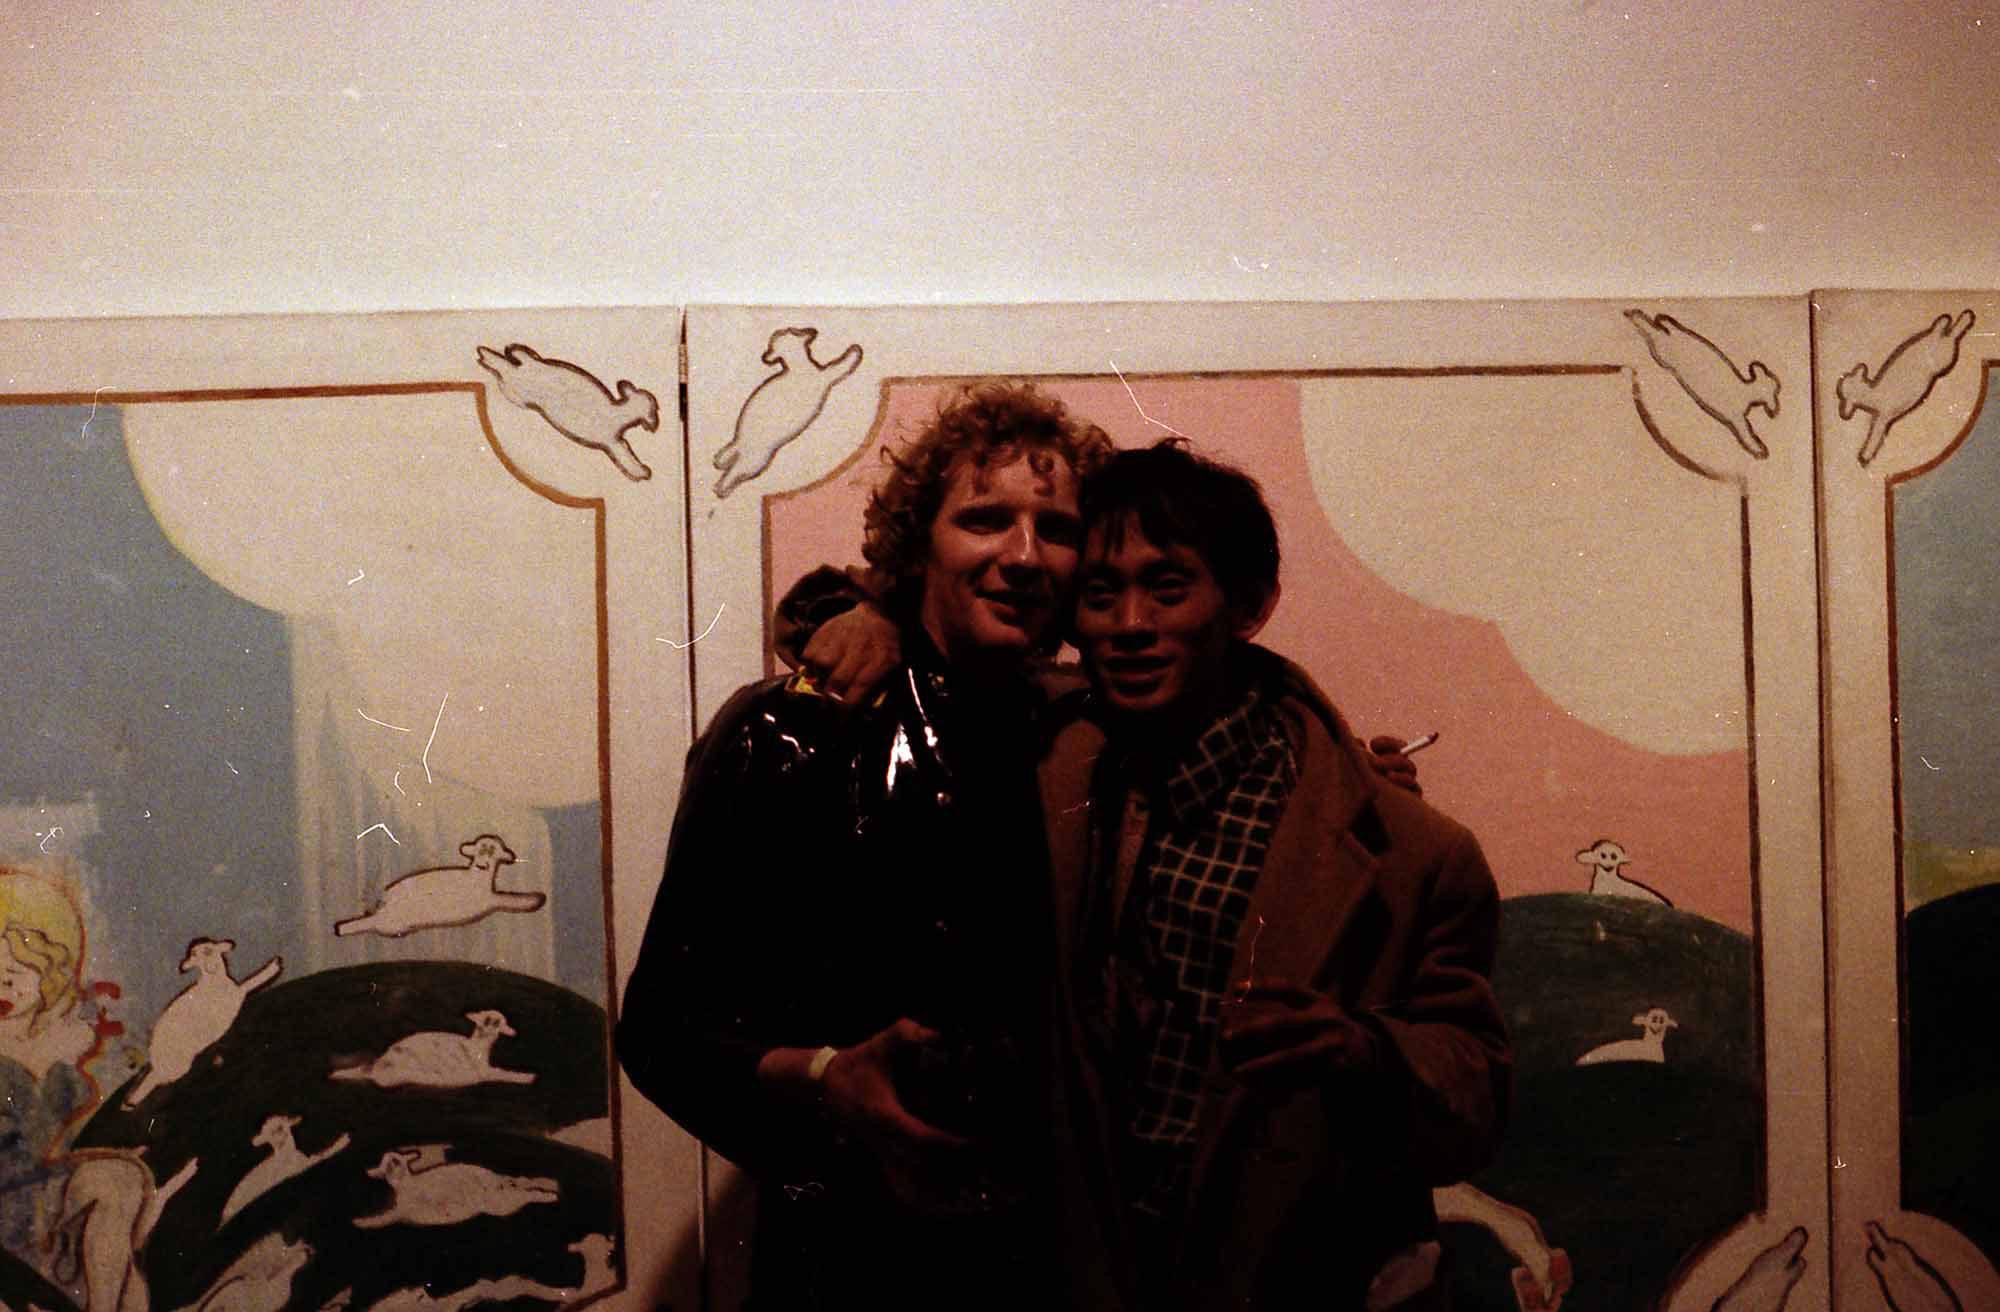 David Medalla and Jock McFadyen during the opening of Jock McFadyen's Paintings exhibition at The Acme Gallery 13 May – 2 June 1978. Courtesy of Jock McFadyen and Acme Archive.